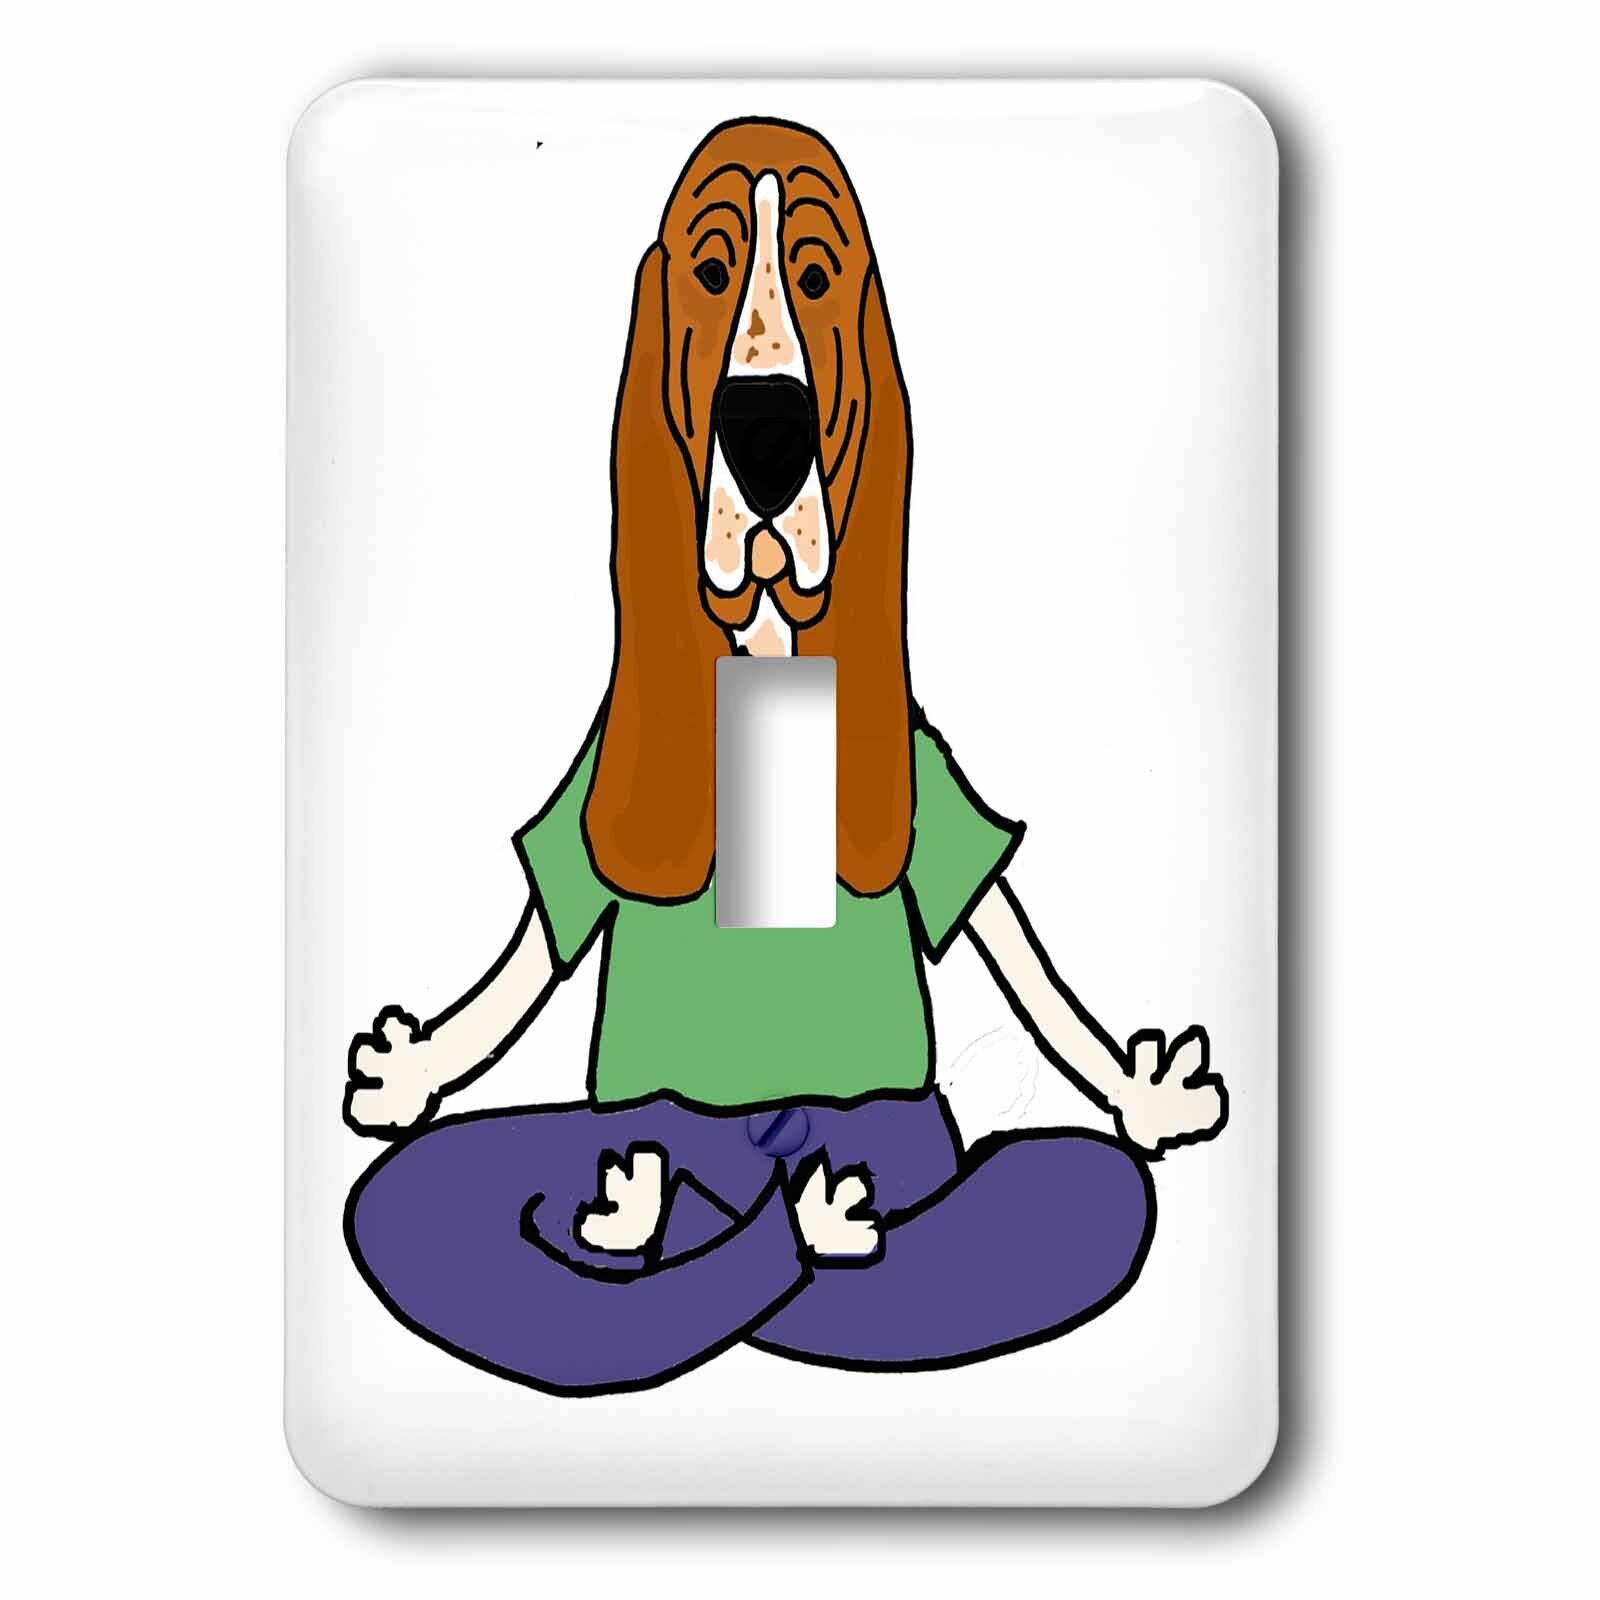 3drose Basset Hound Dog Yoga 1 Gang Toggle Light Switch Wall Plate Wayfair